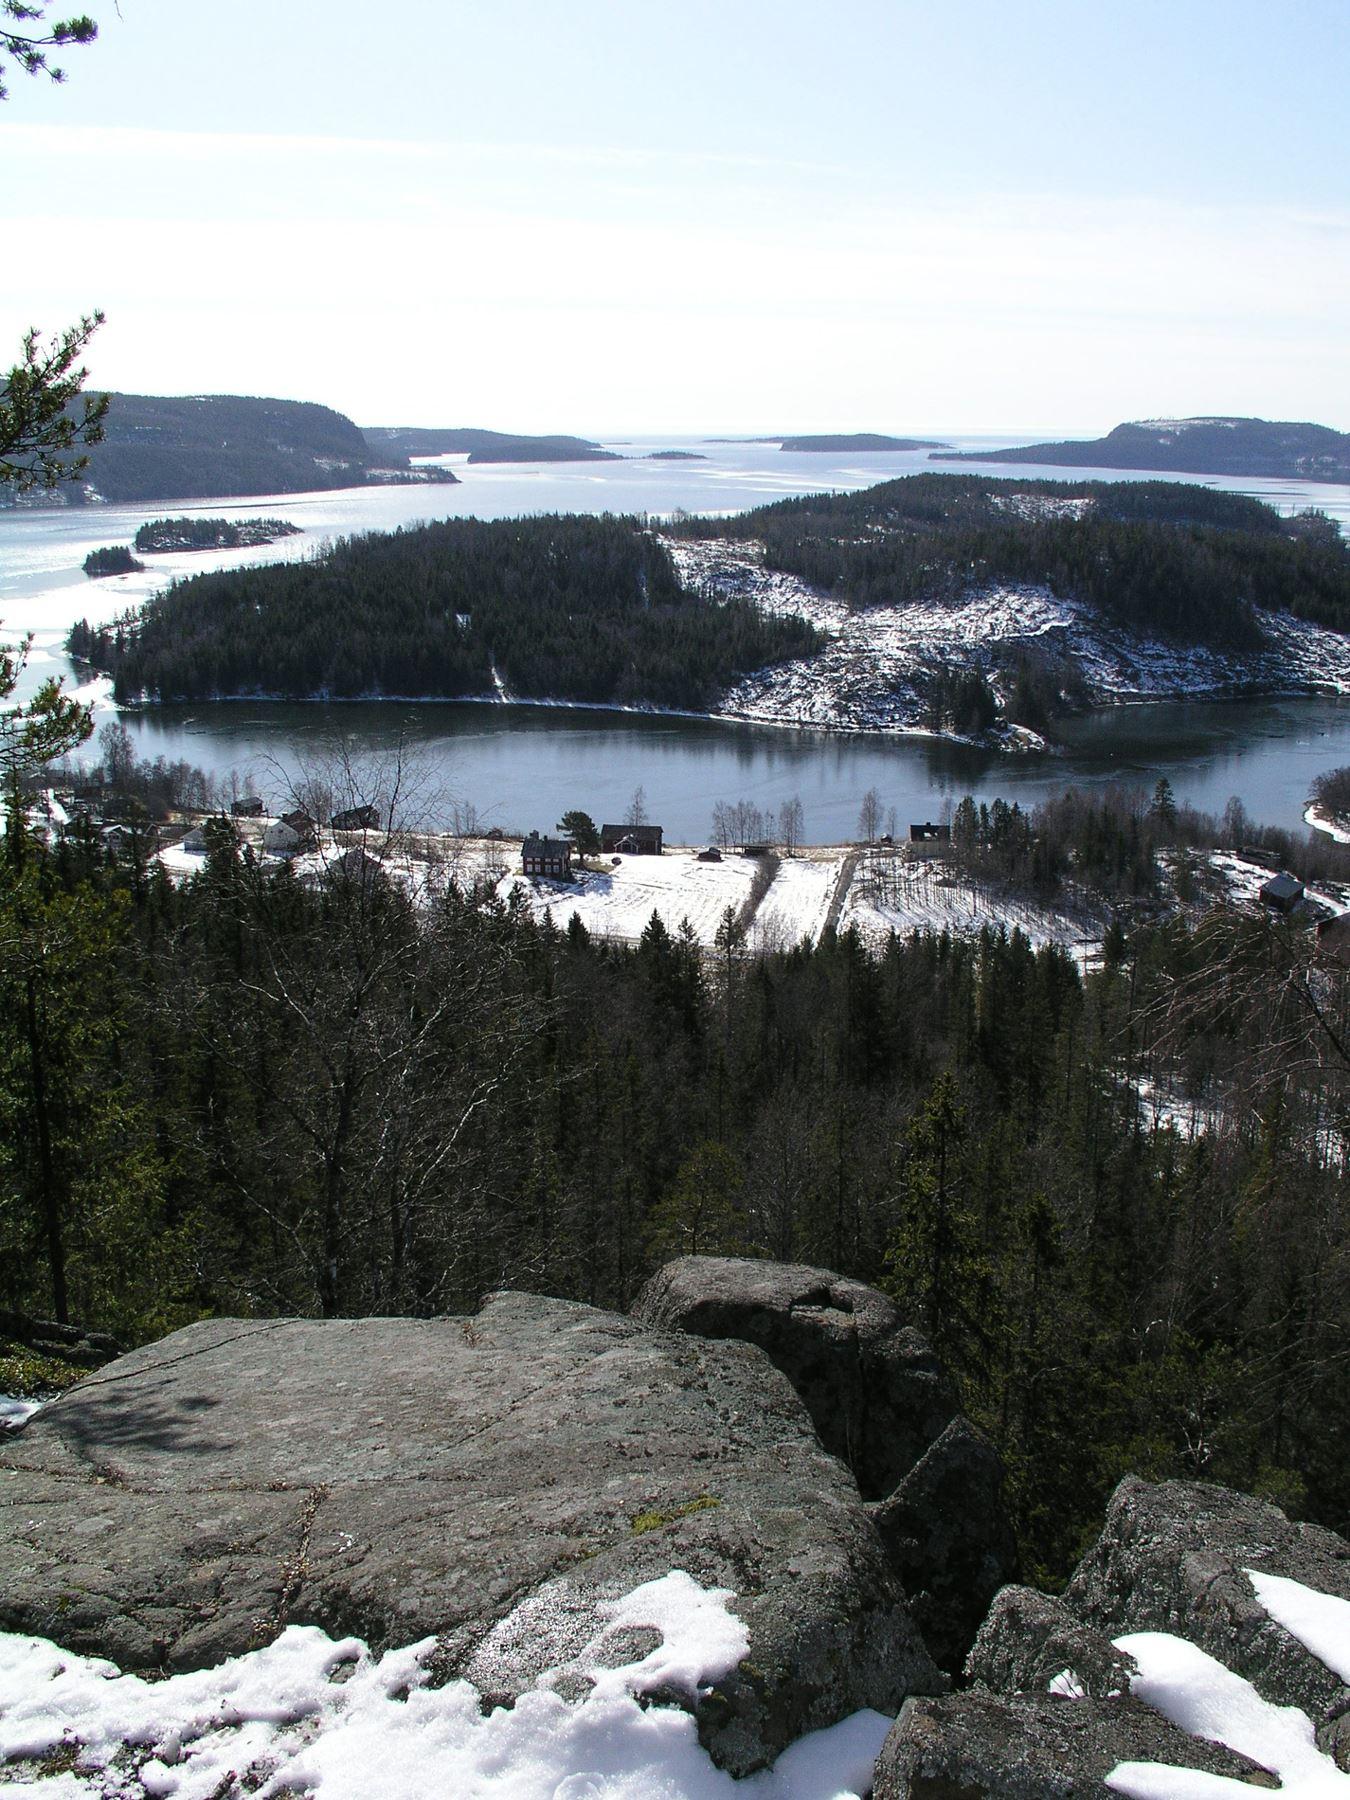 foto: Milly Lundstedt, Rödklitten